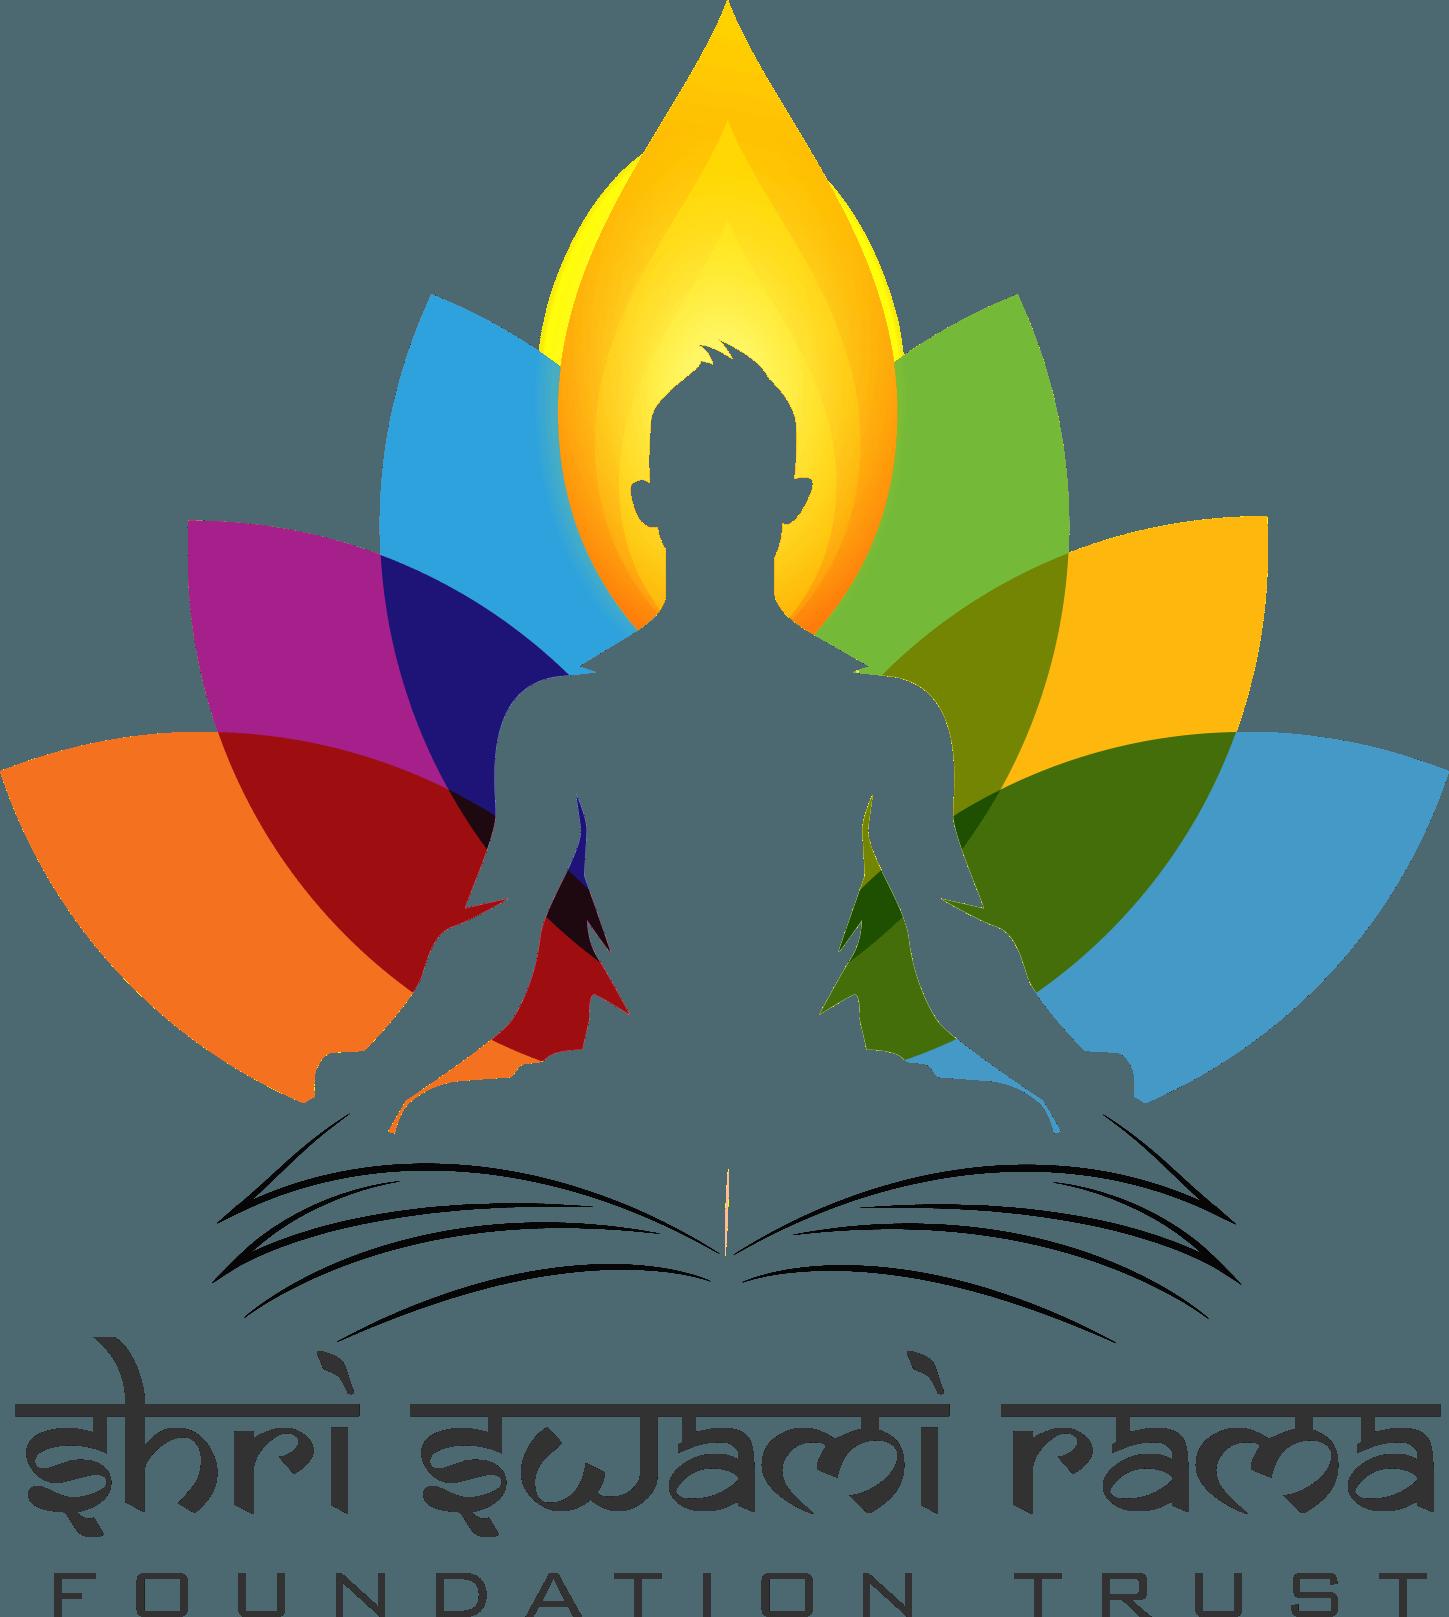 Shri Swami Rama Foundation Trust